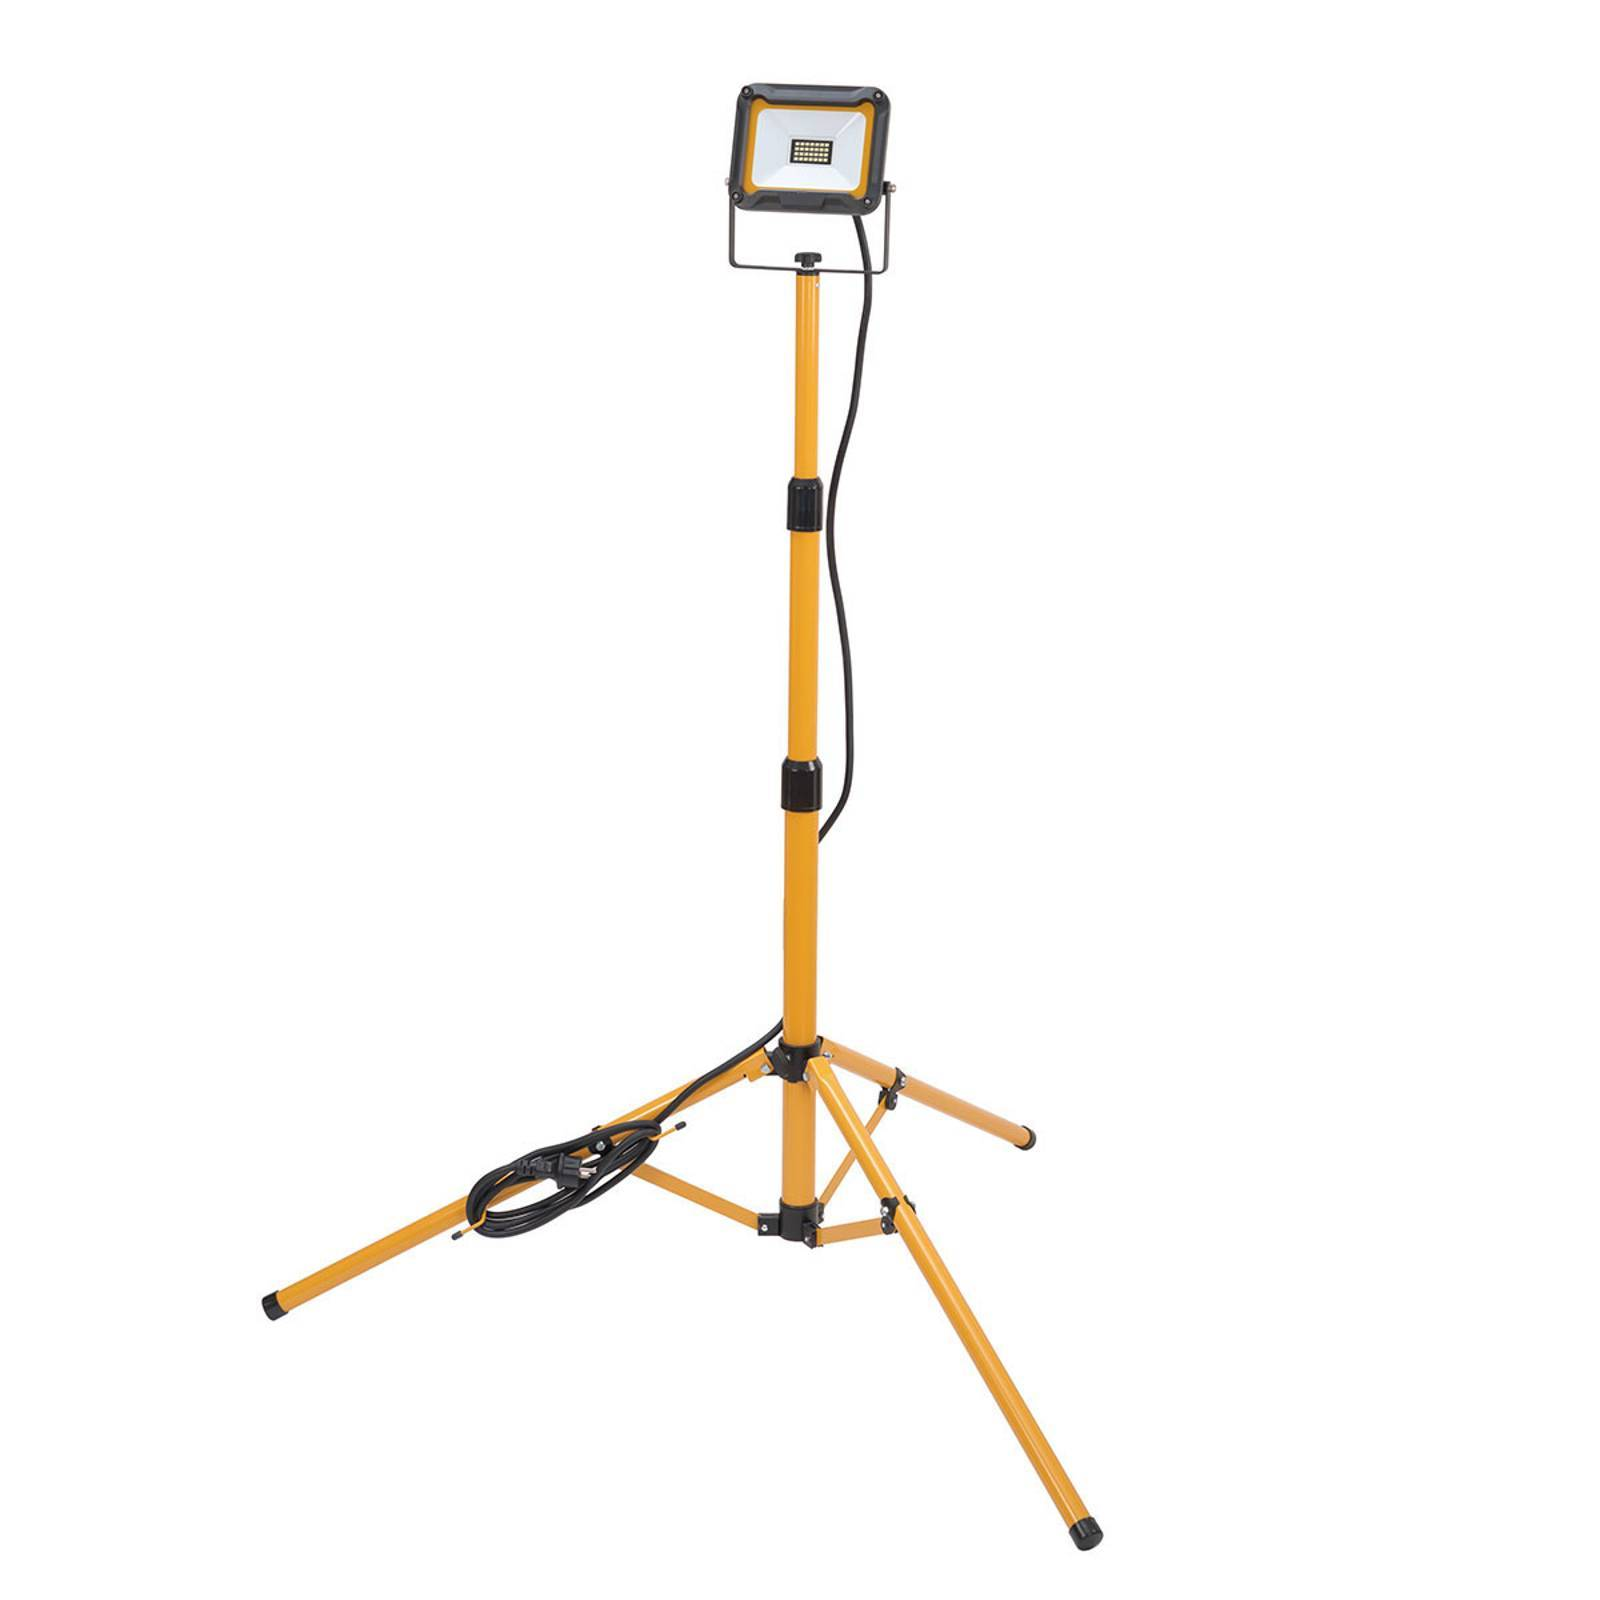 Brenenstuhl LED-arbetslampa Jaro med stativ IP65 1 lampa 20 W